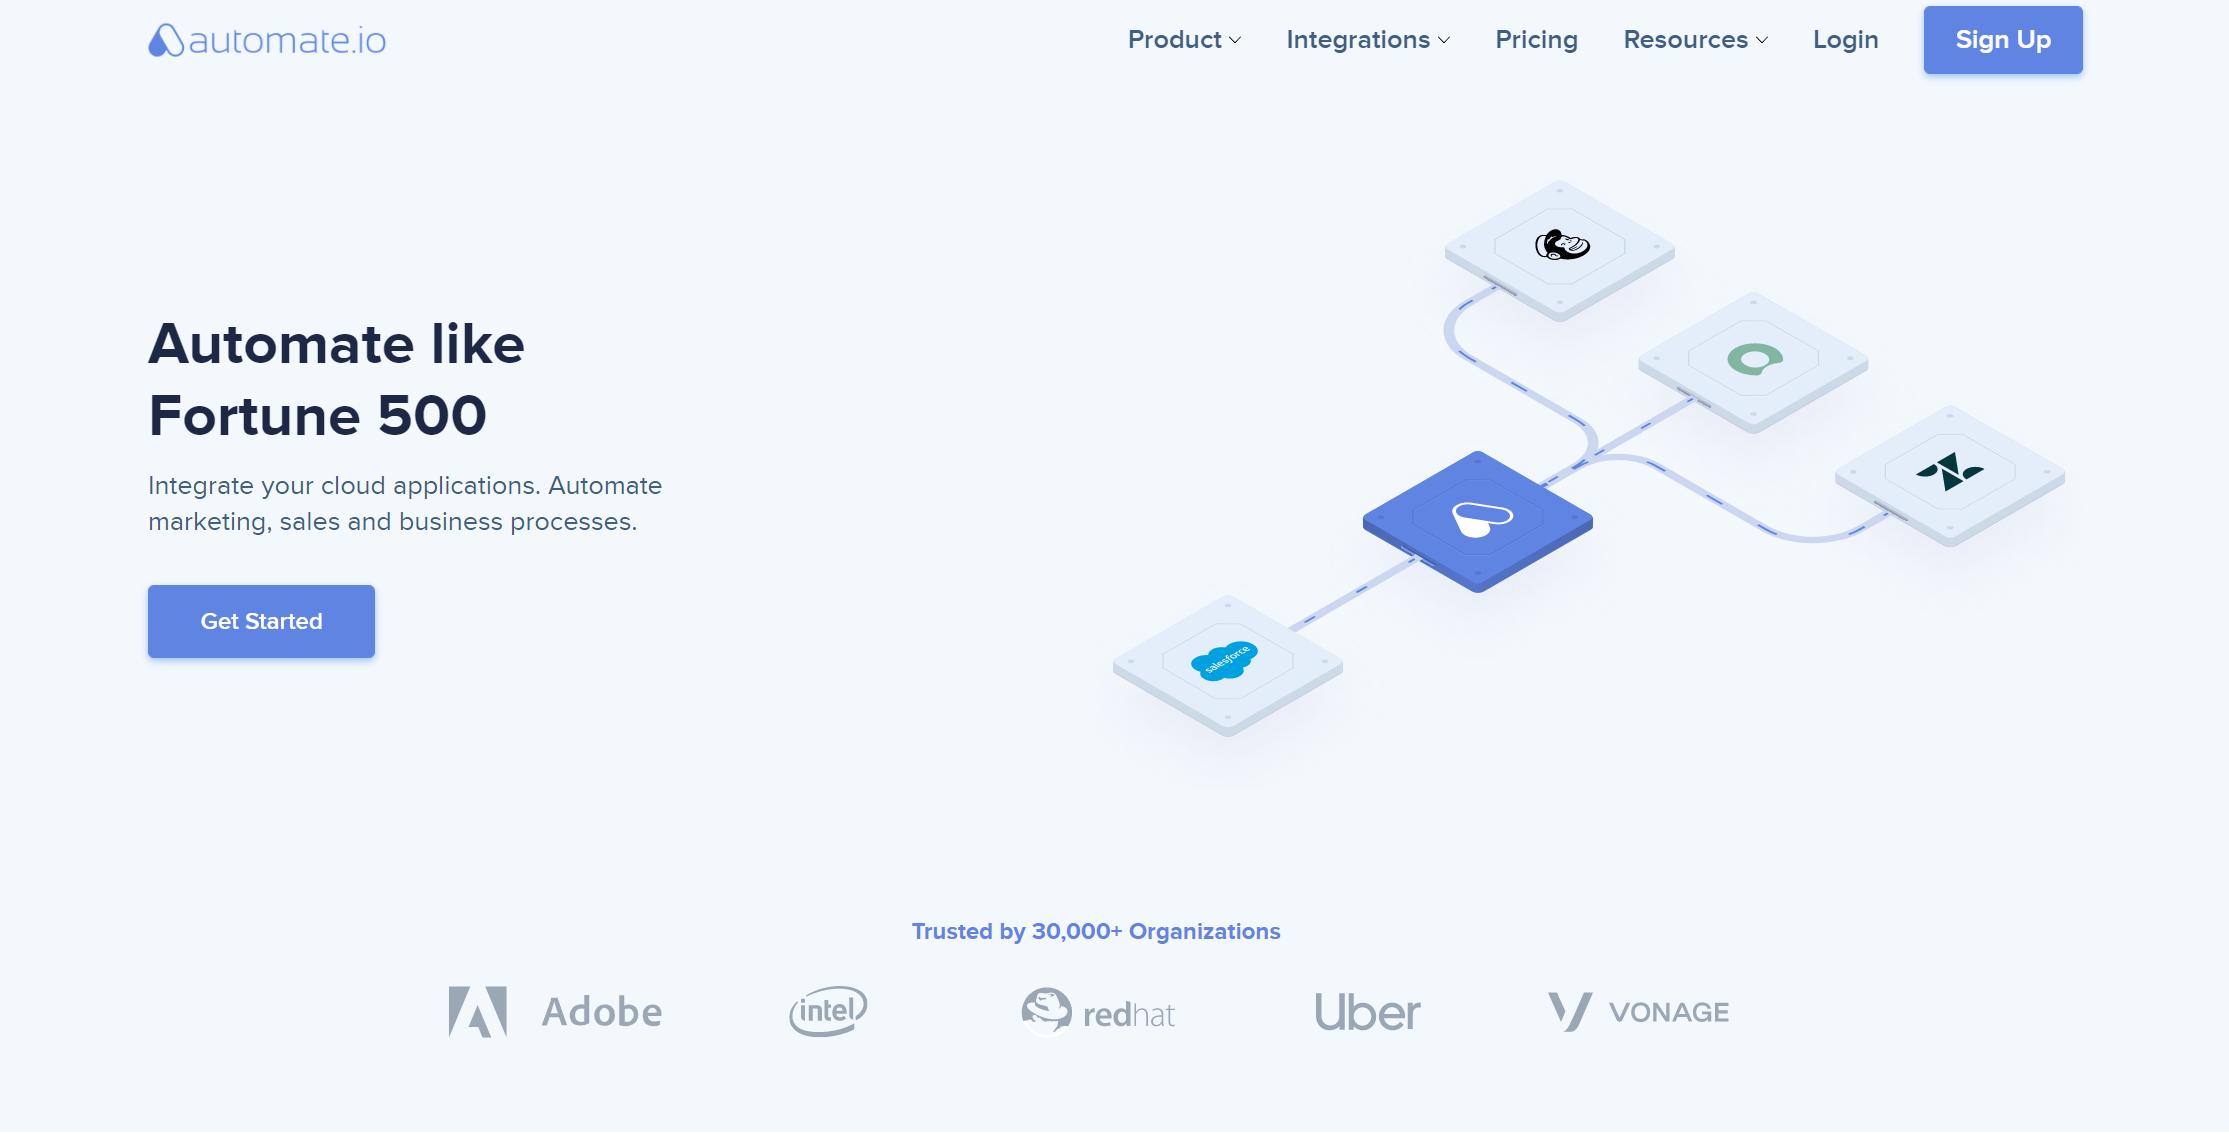 Automate.io nocode platform